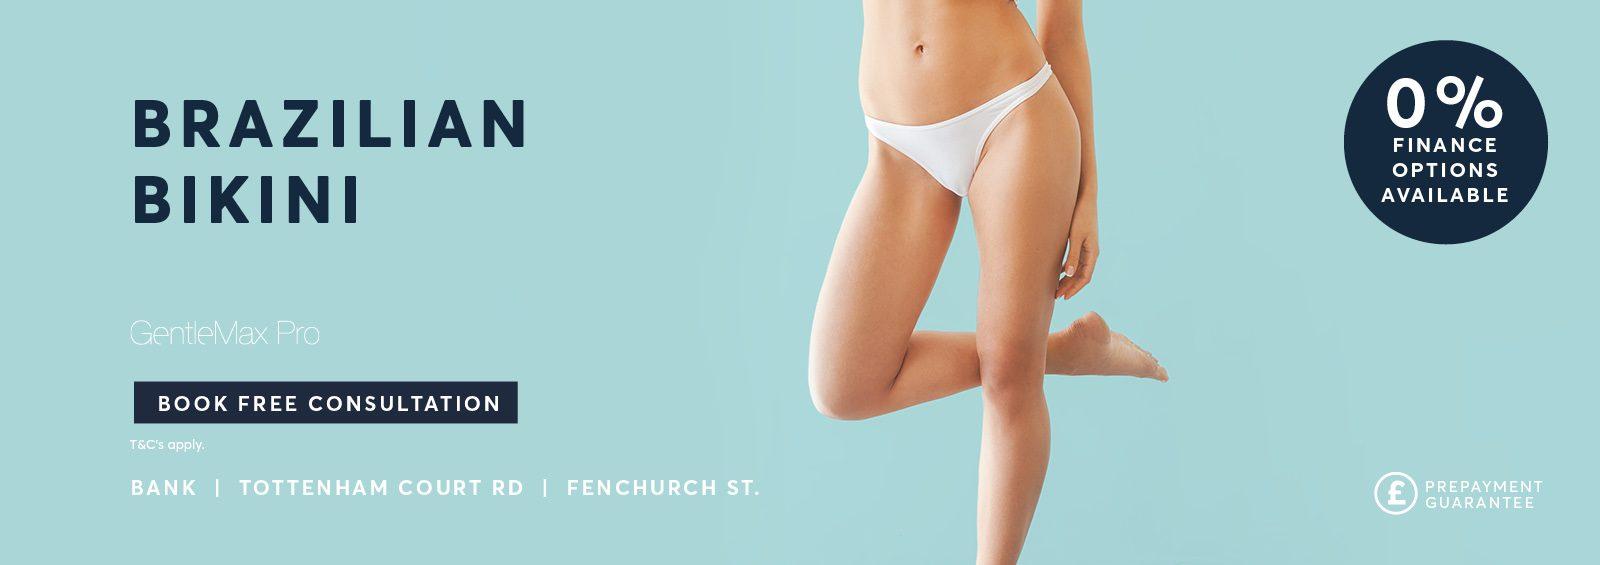 Brazilian Bikini Laser Hair removal